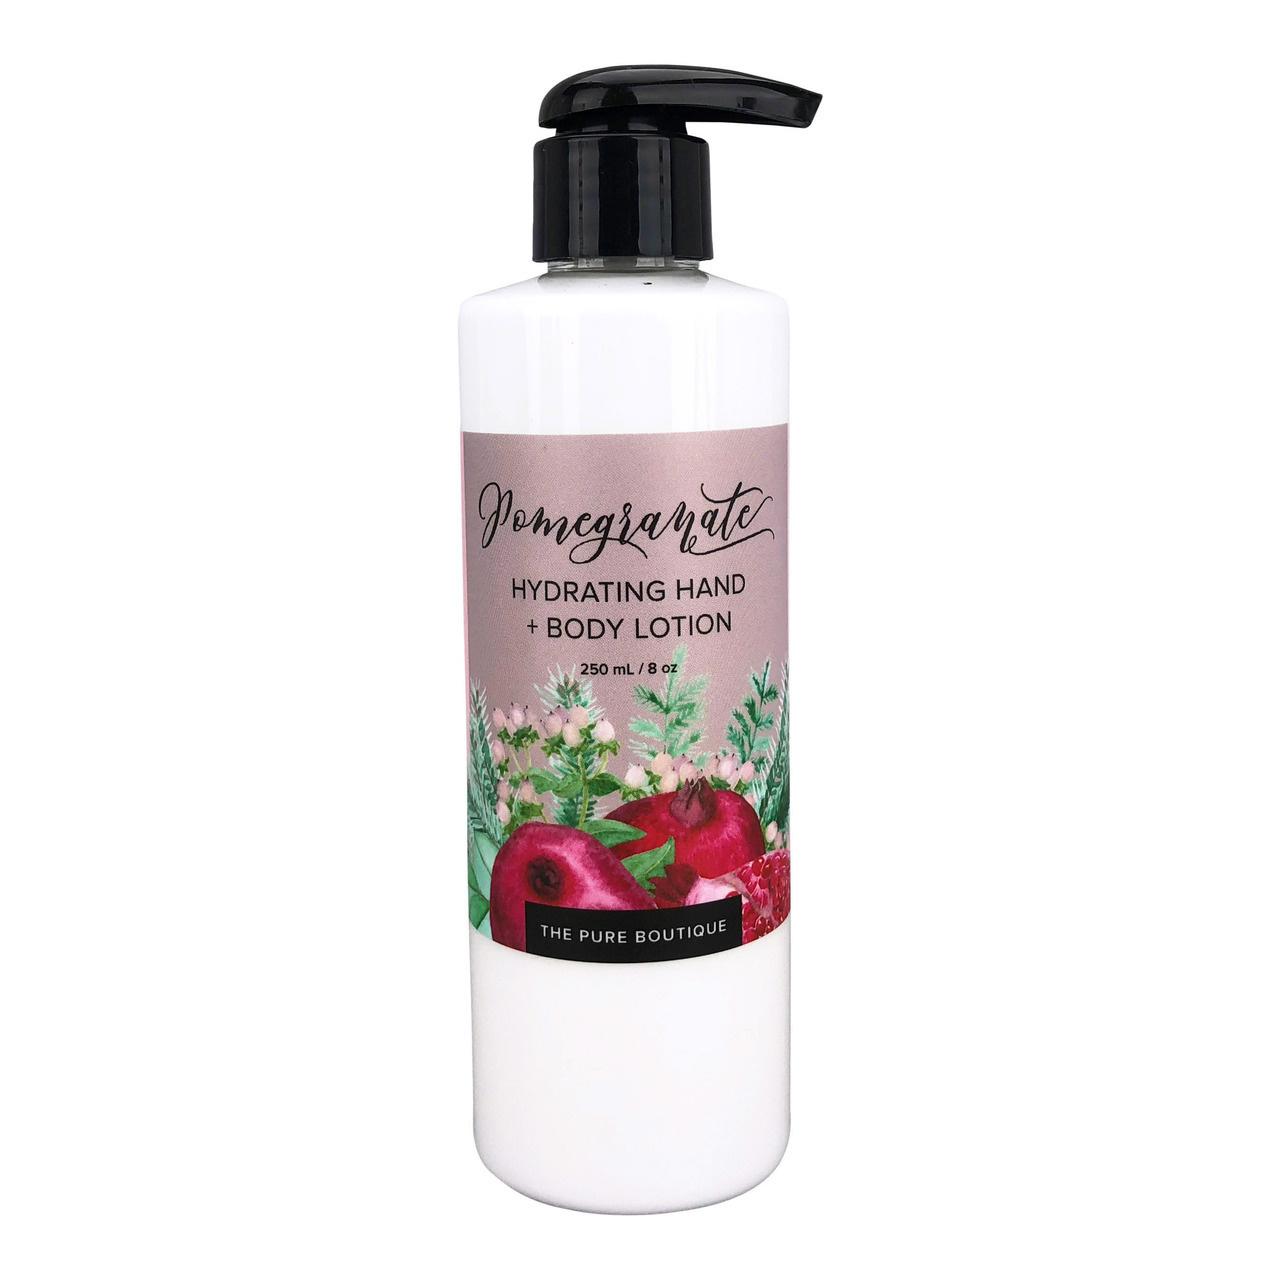 Hydrating Hand & Body Lotion - Pomegranate-1